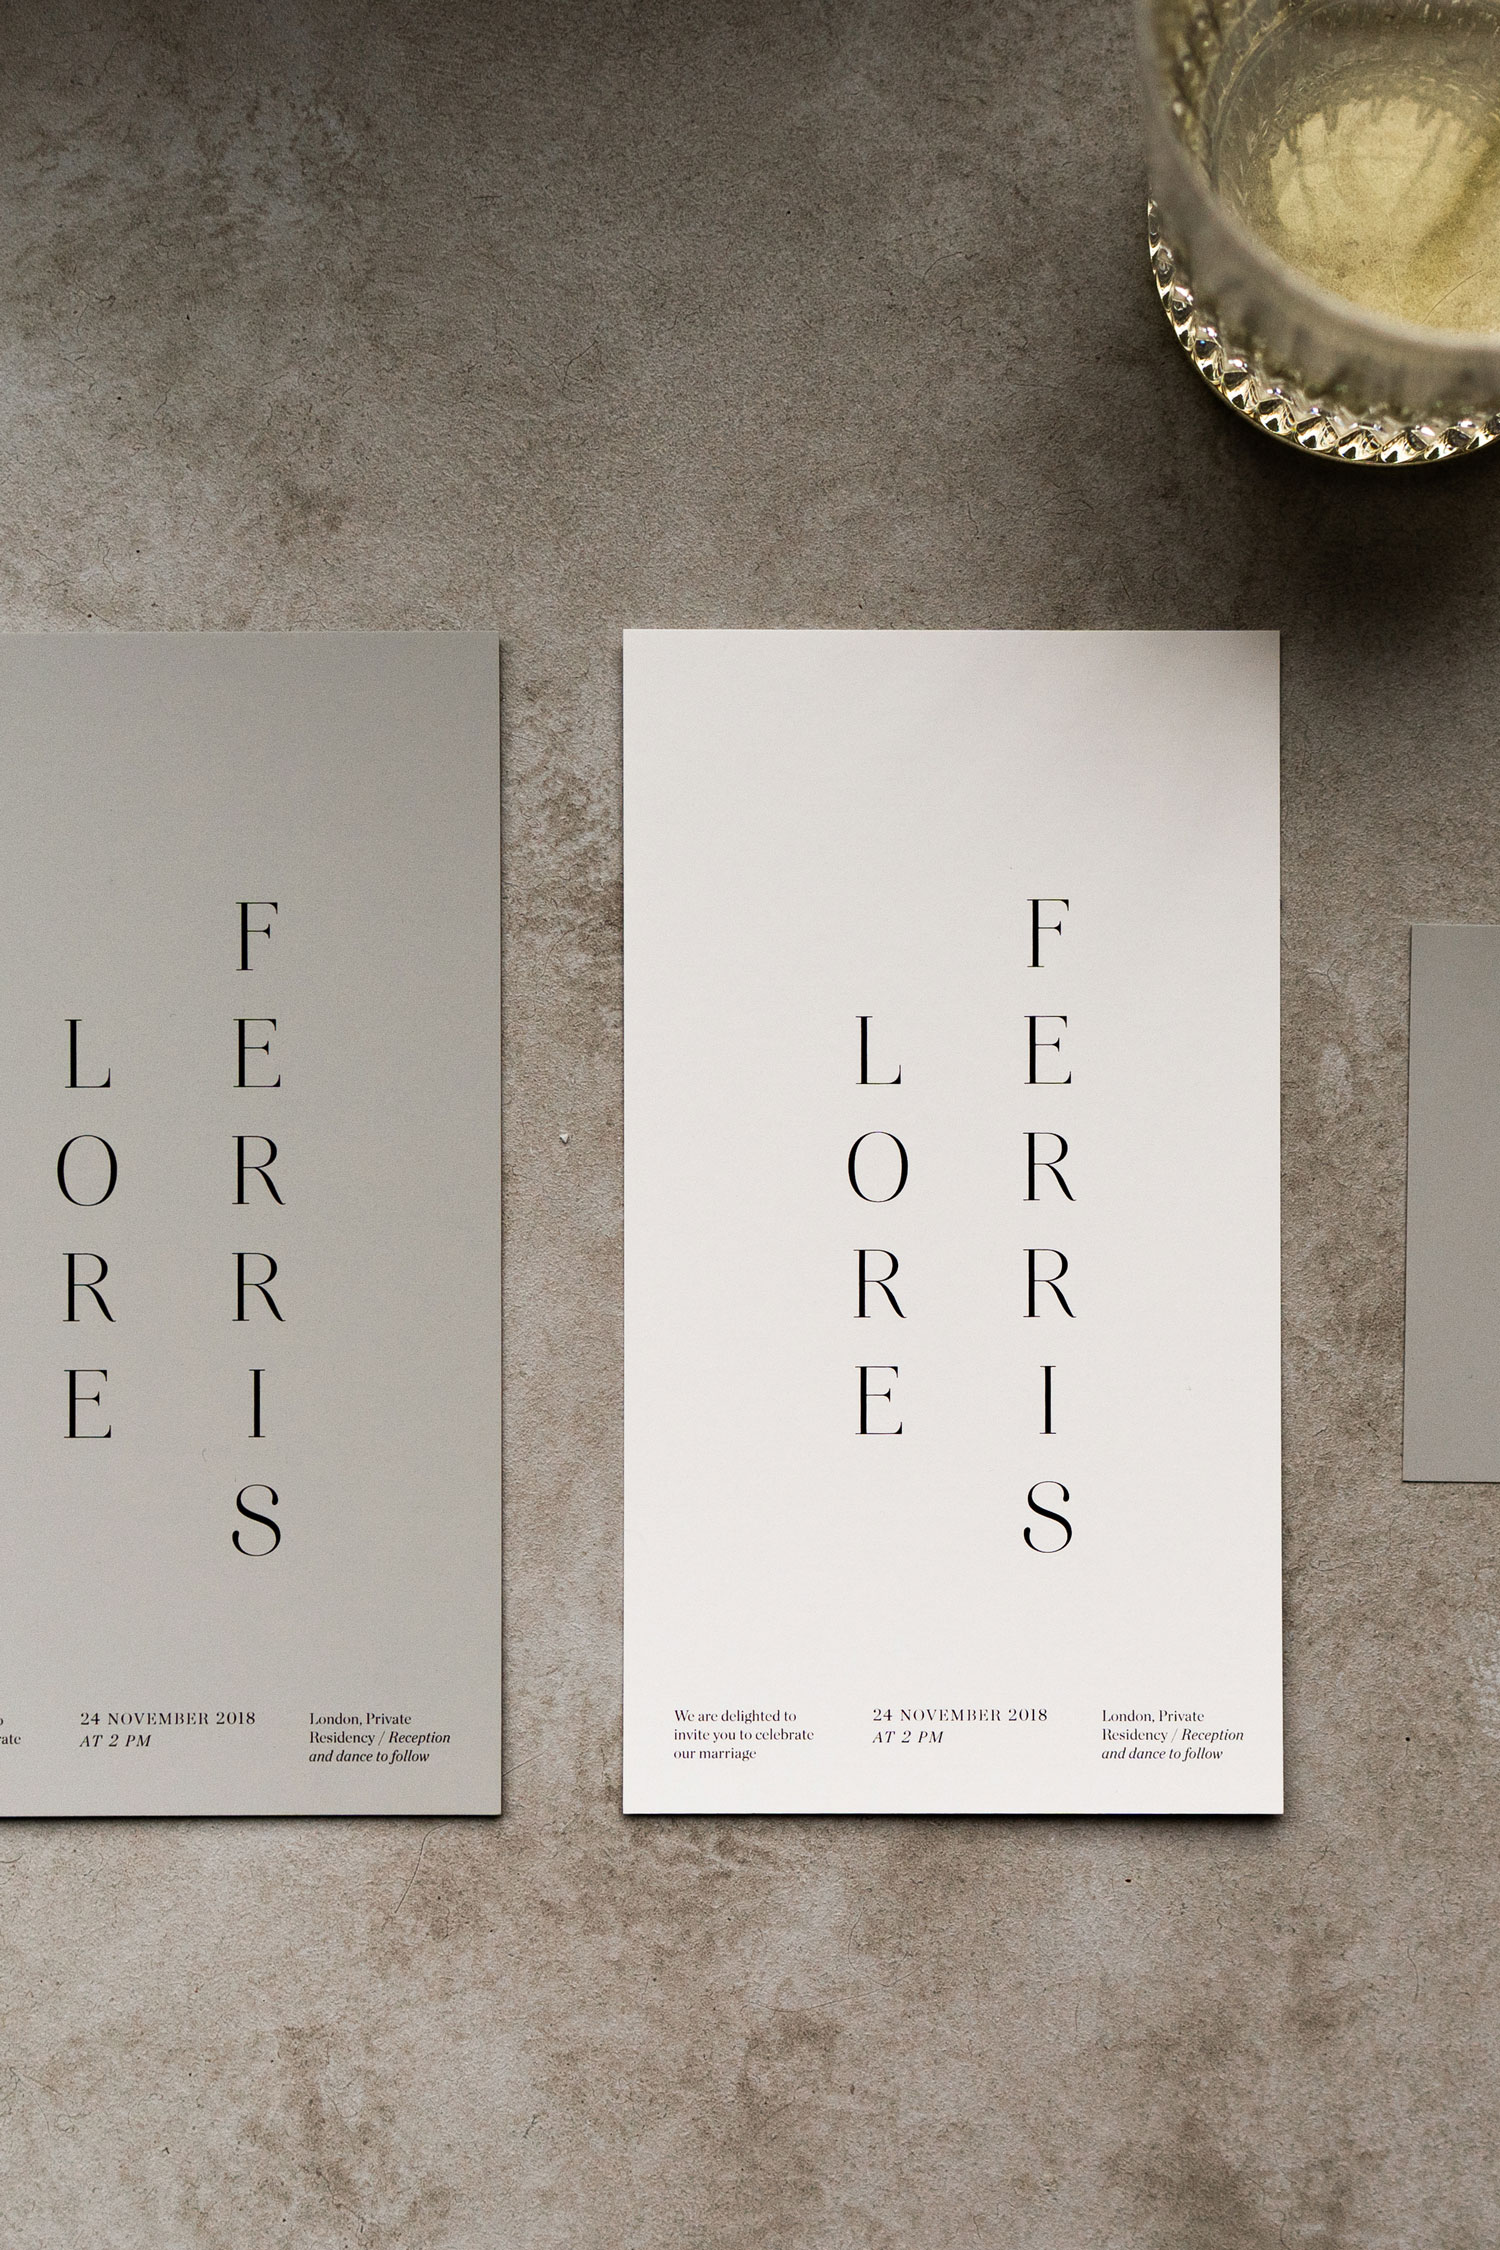 Sixfold-Teres-invitation-4.jpg